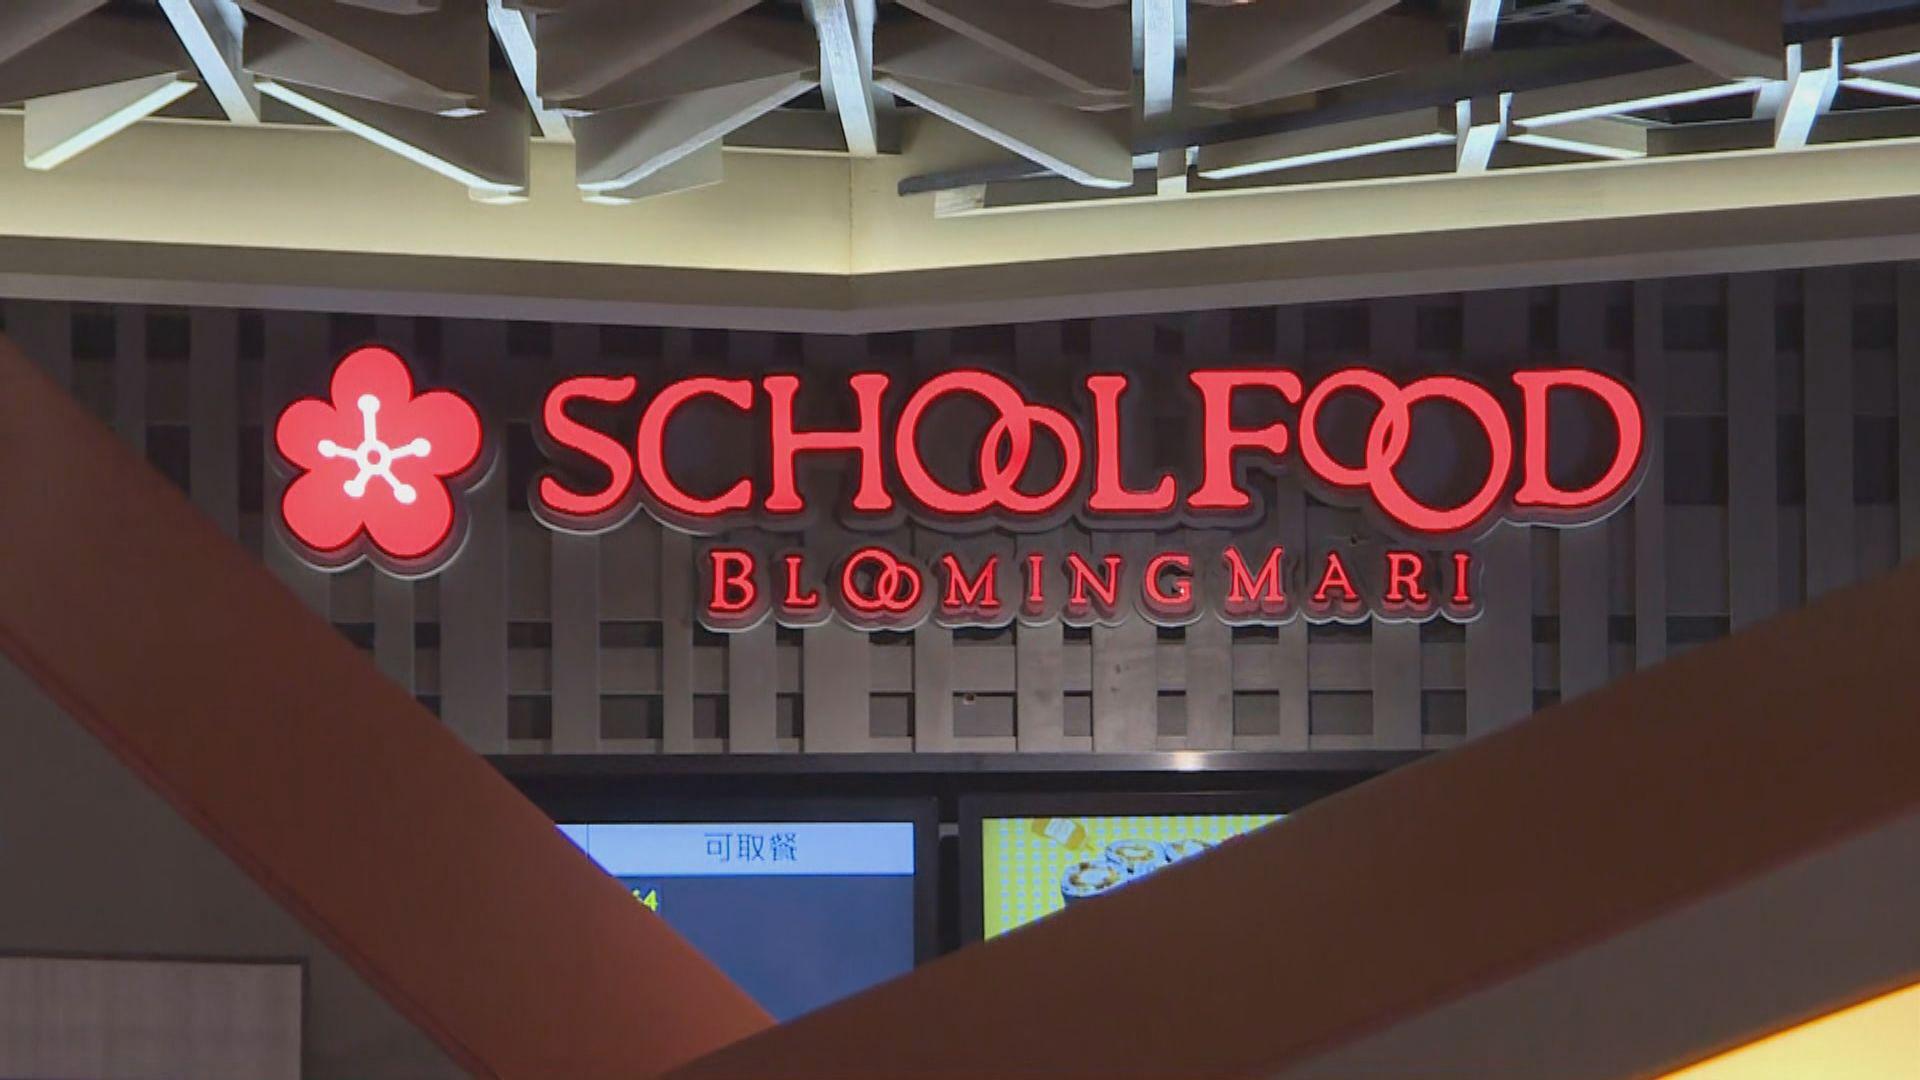 九人進食SCHOOL FOOD外賣蛋包飯疑食物中毒